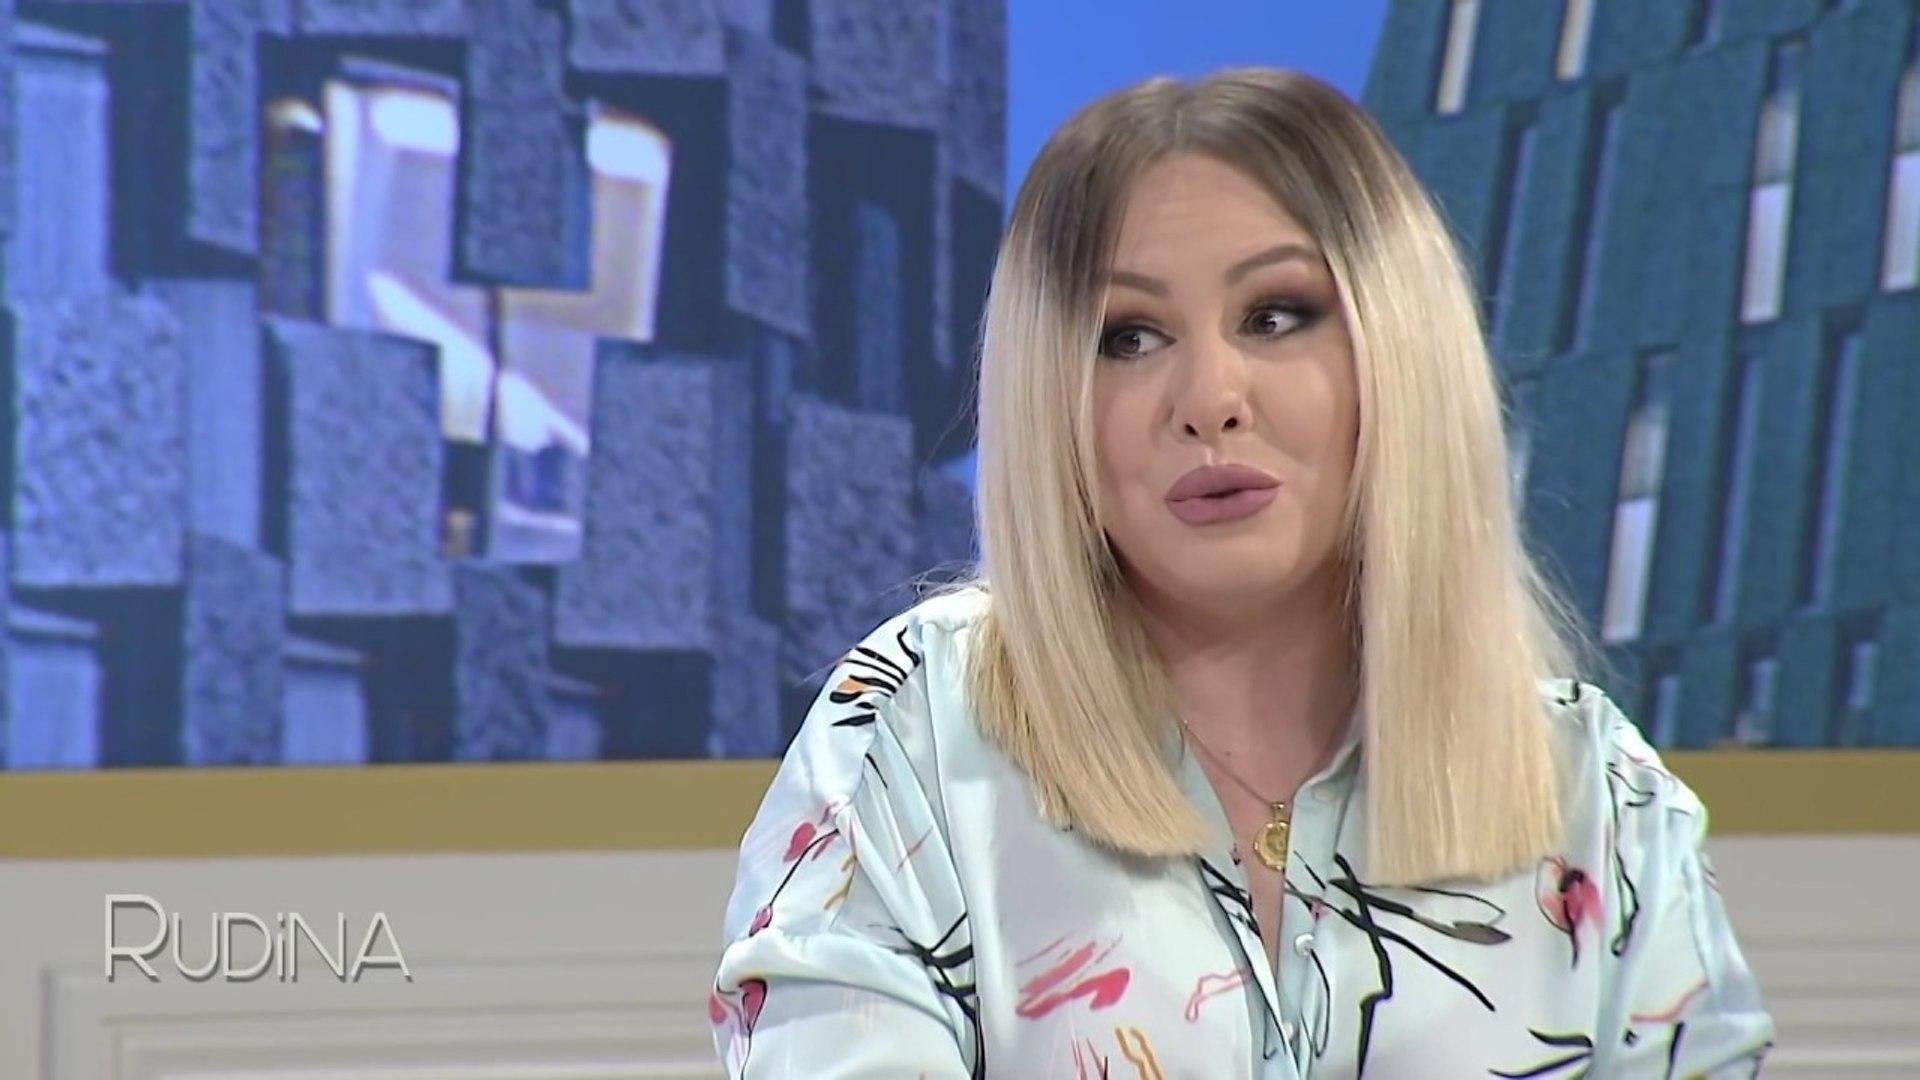 Rudina - Best of - Vesa Luma dhe Big Basta, jeta e re si prinder! (27 korrik 2017)